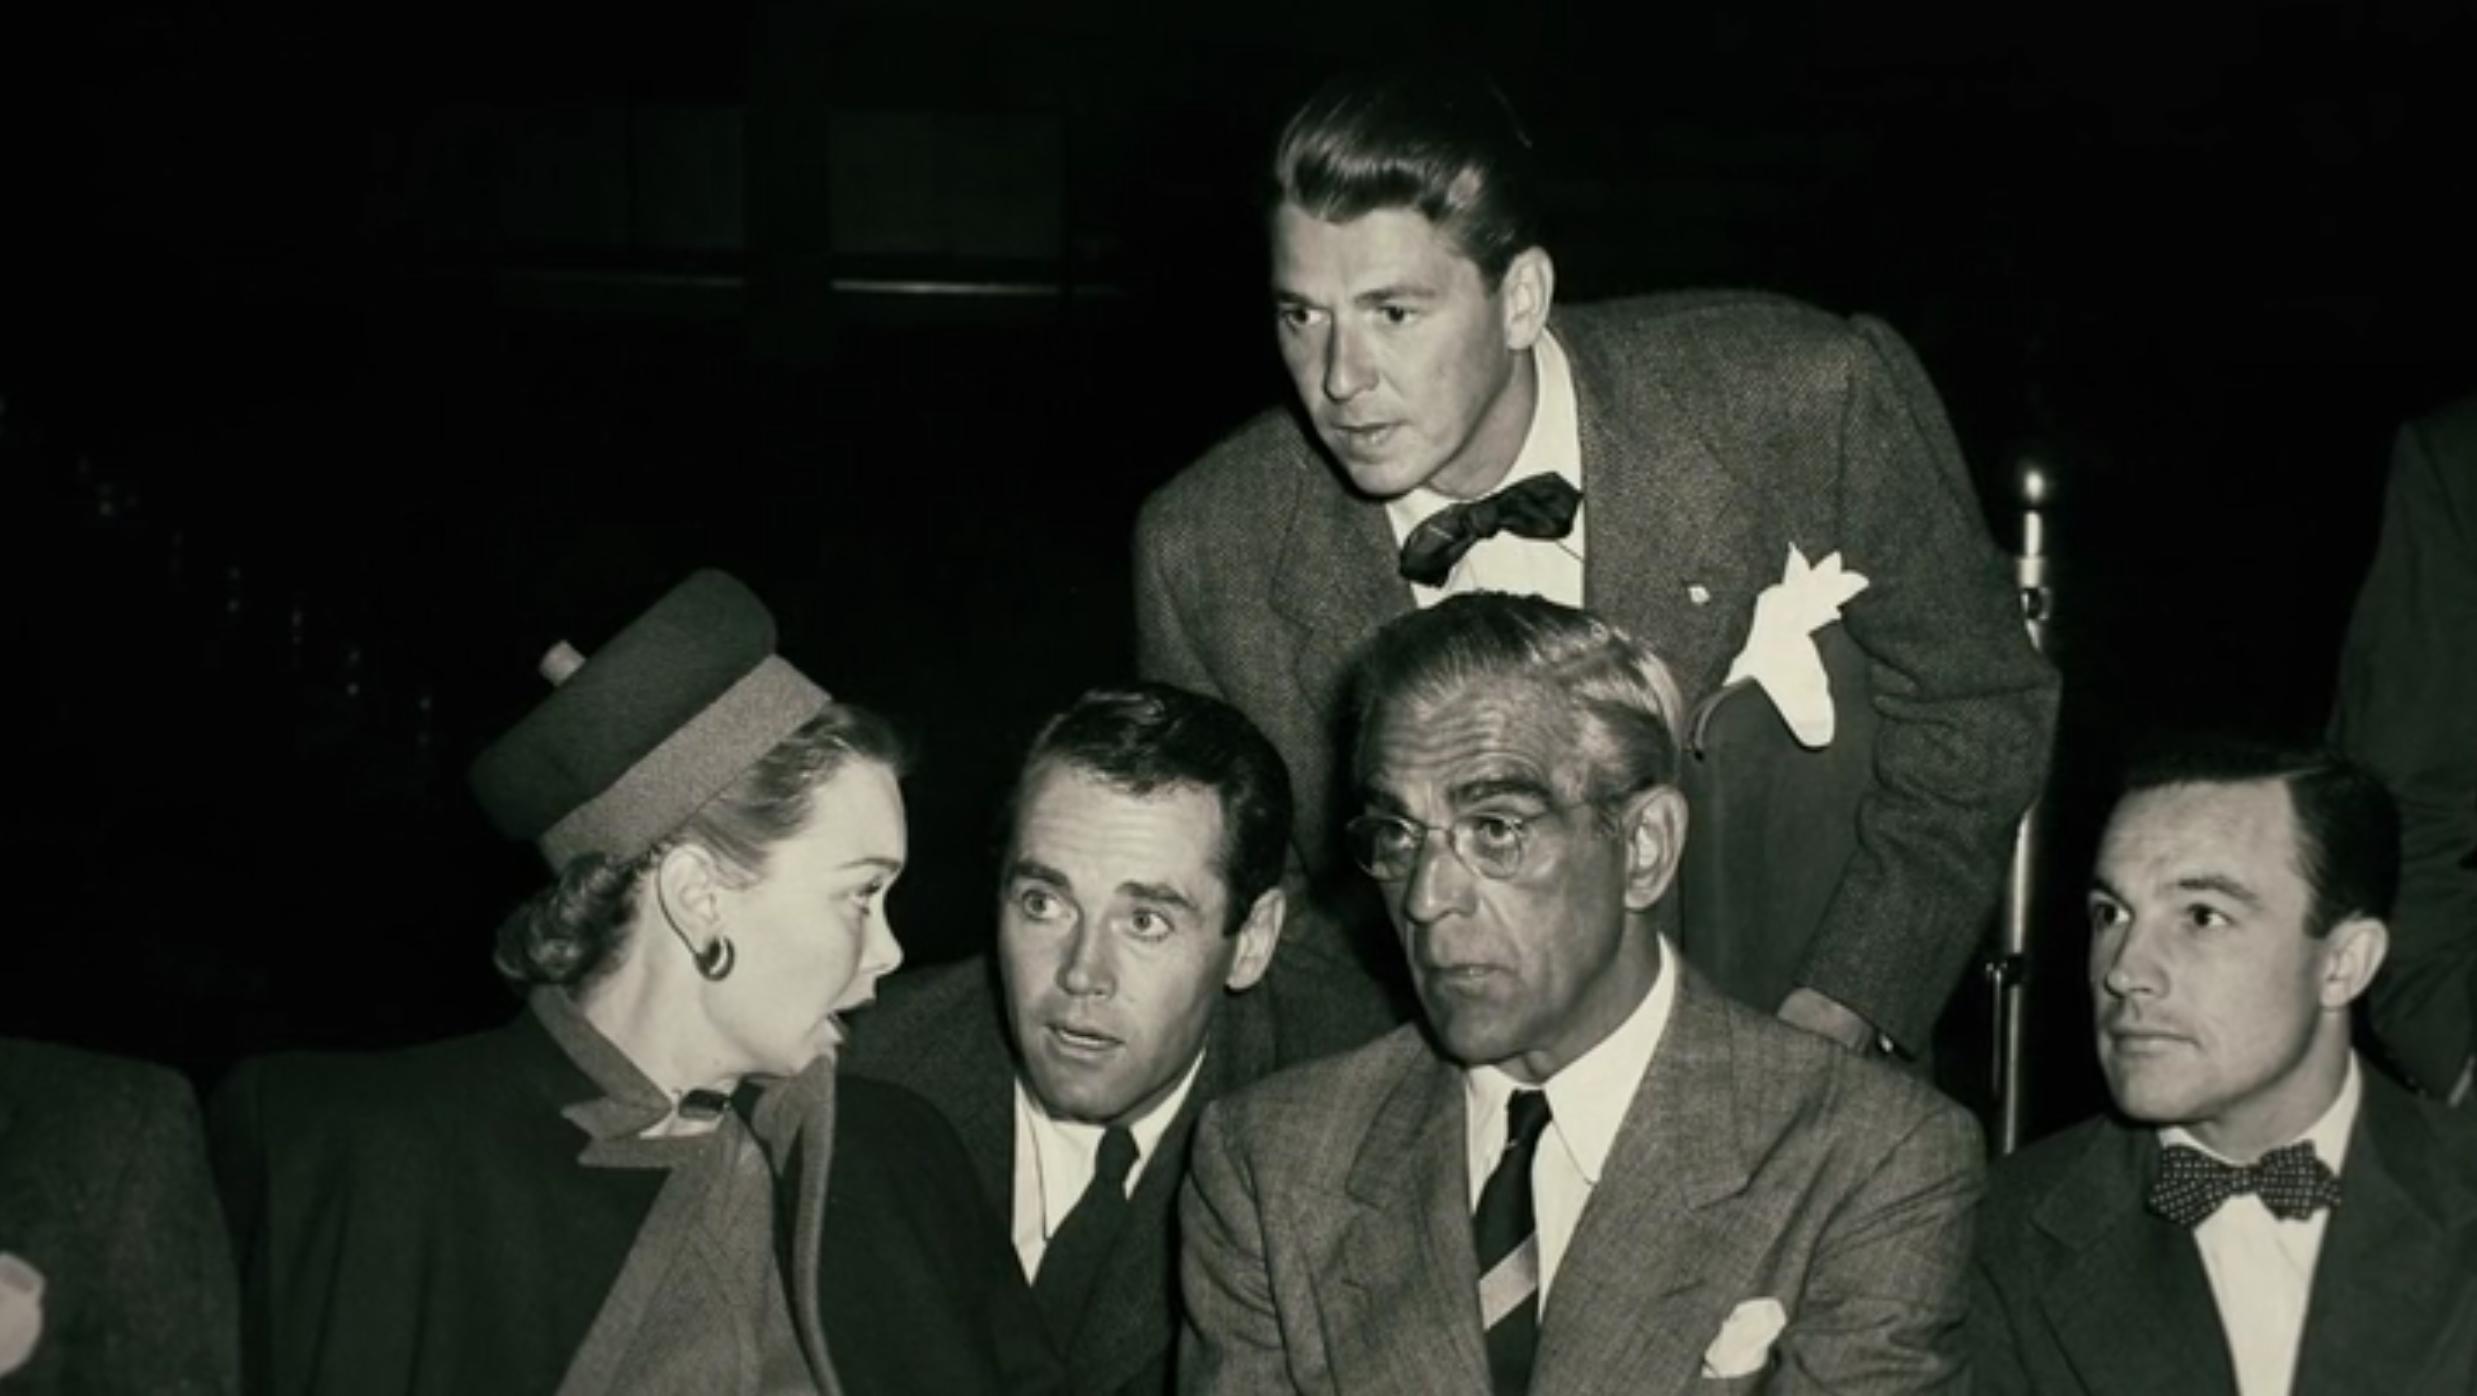 Henry Fonda, Gene Kelly, Boris Karloff, Ronald Reagan, and Jane Wyman in The Reagans (2020)